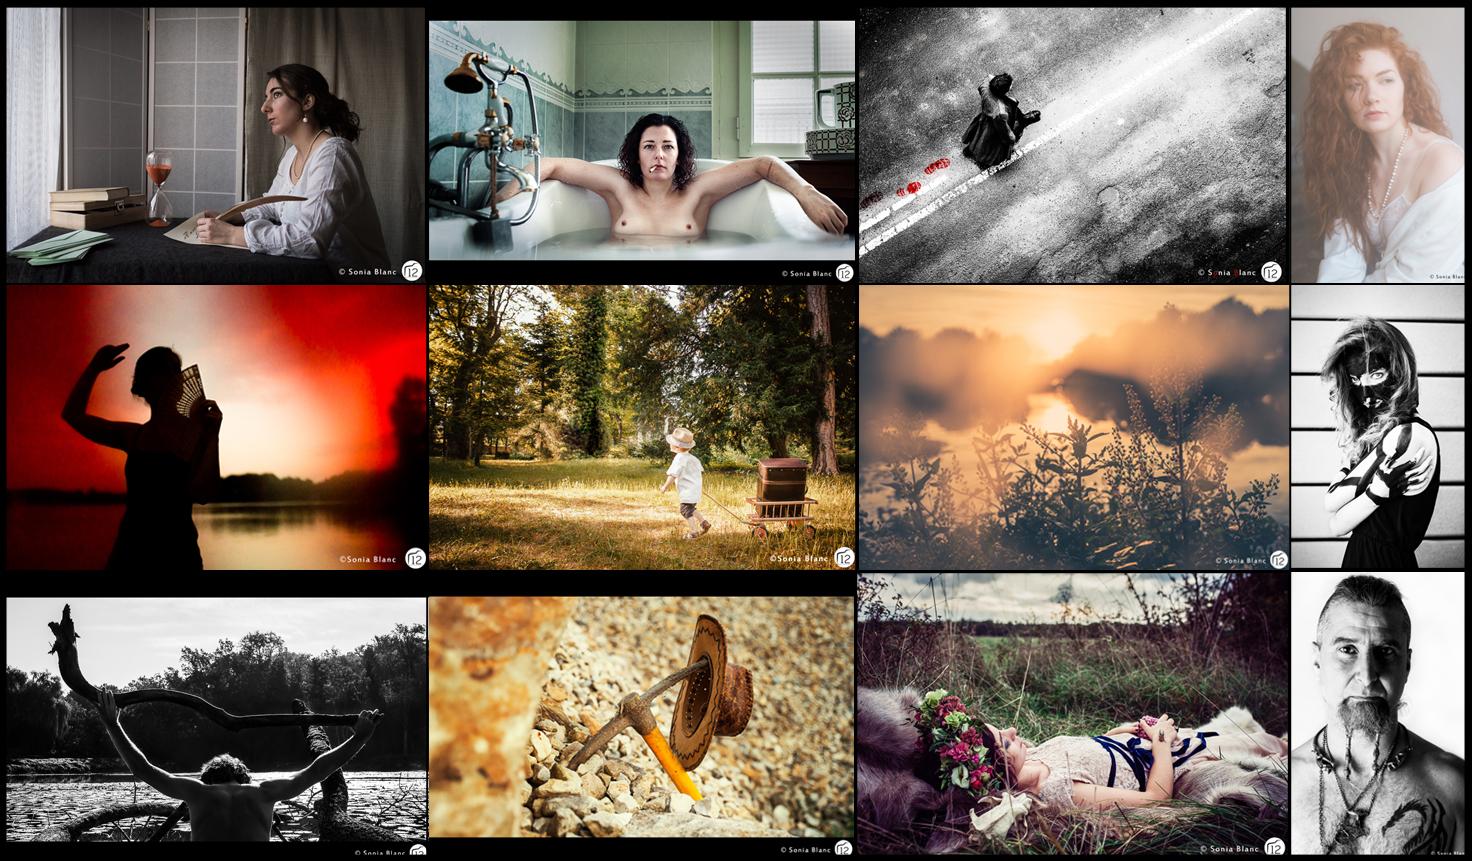 Sonia-Blanc-12-photographes-sinspirent